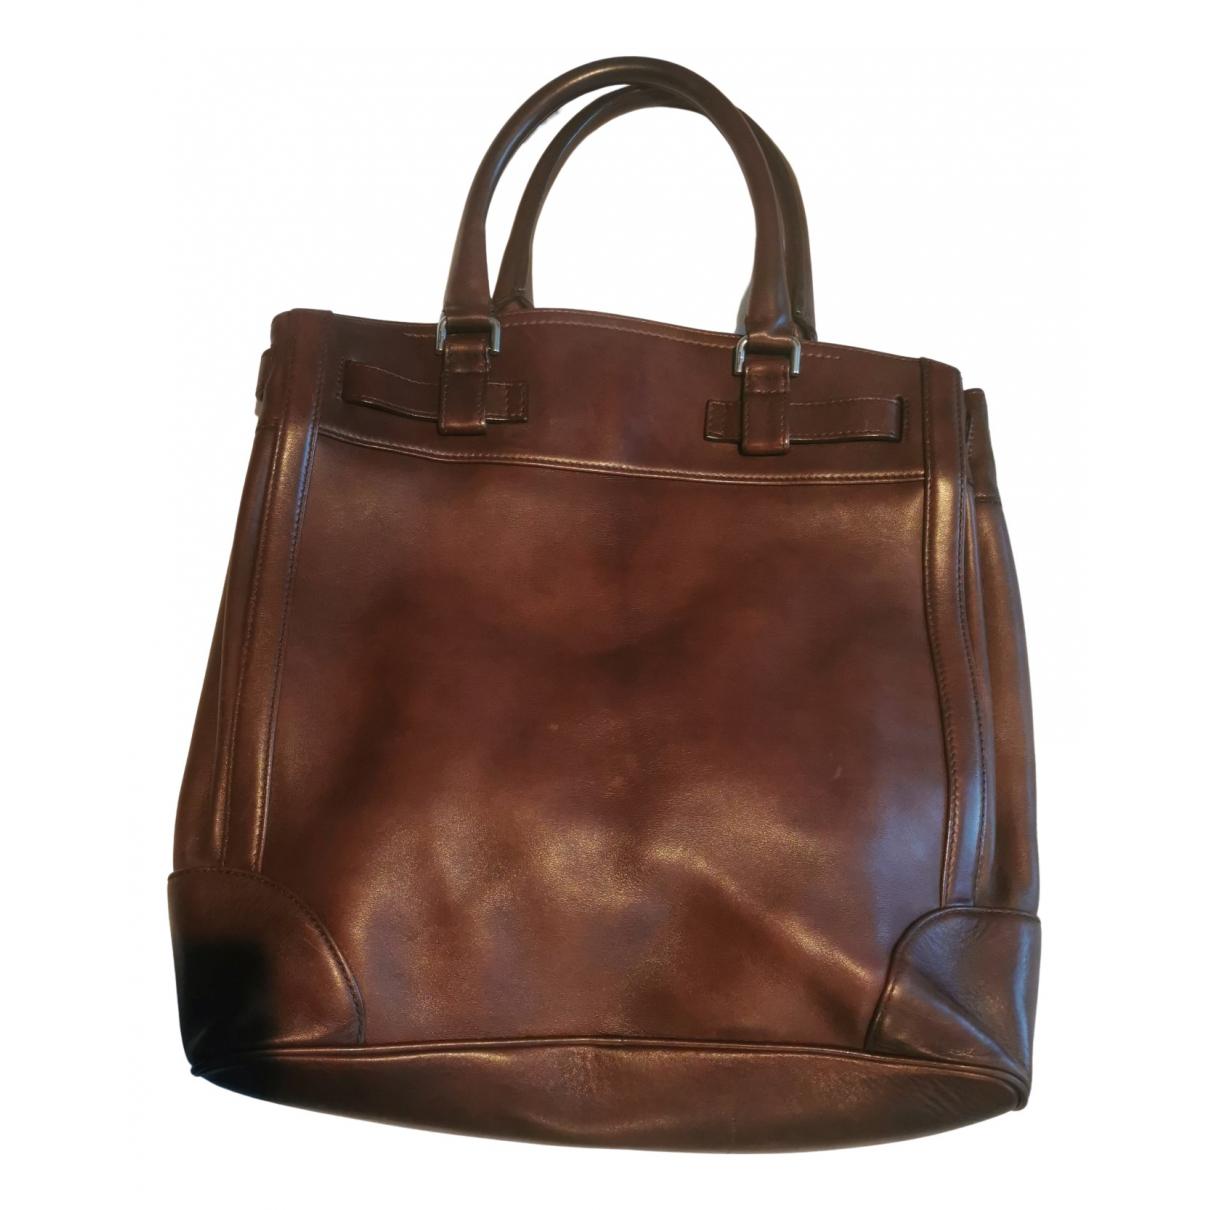 Salvatore Ferragamo N Burgundy Leather bag for Men N